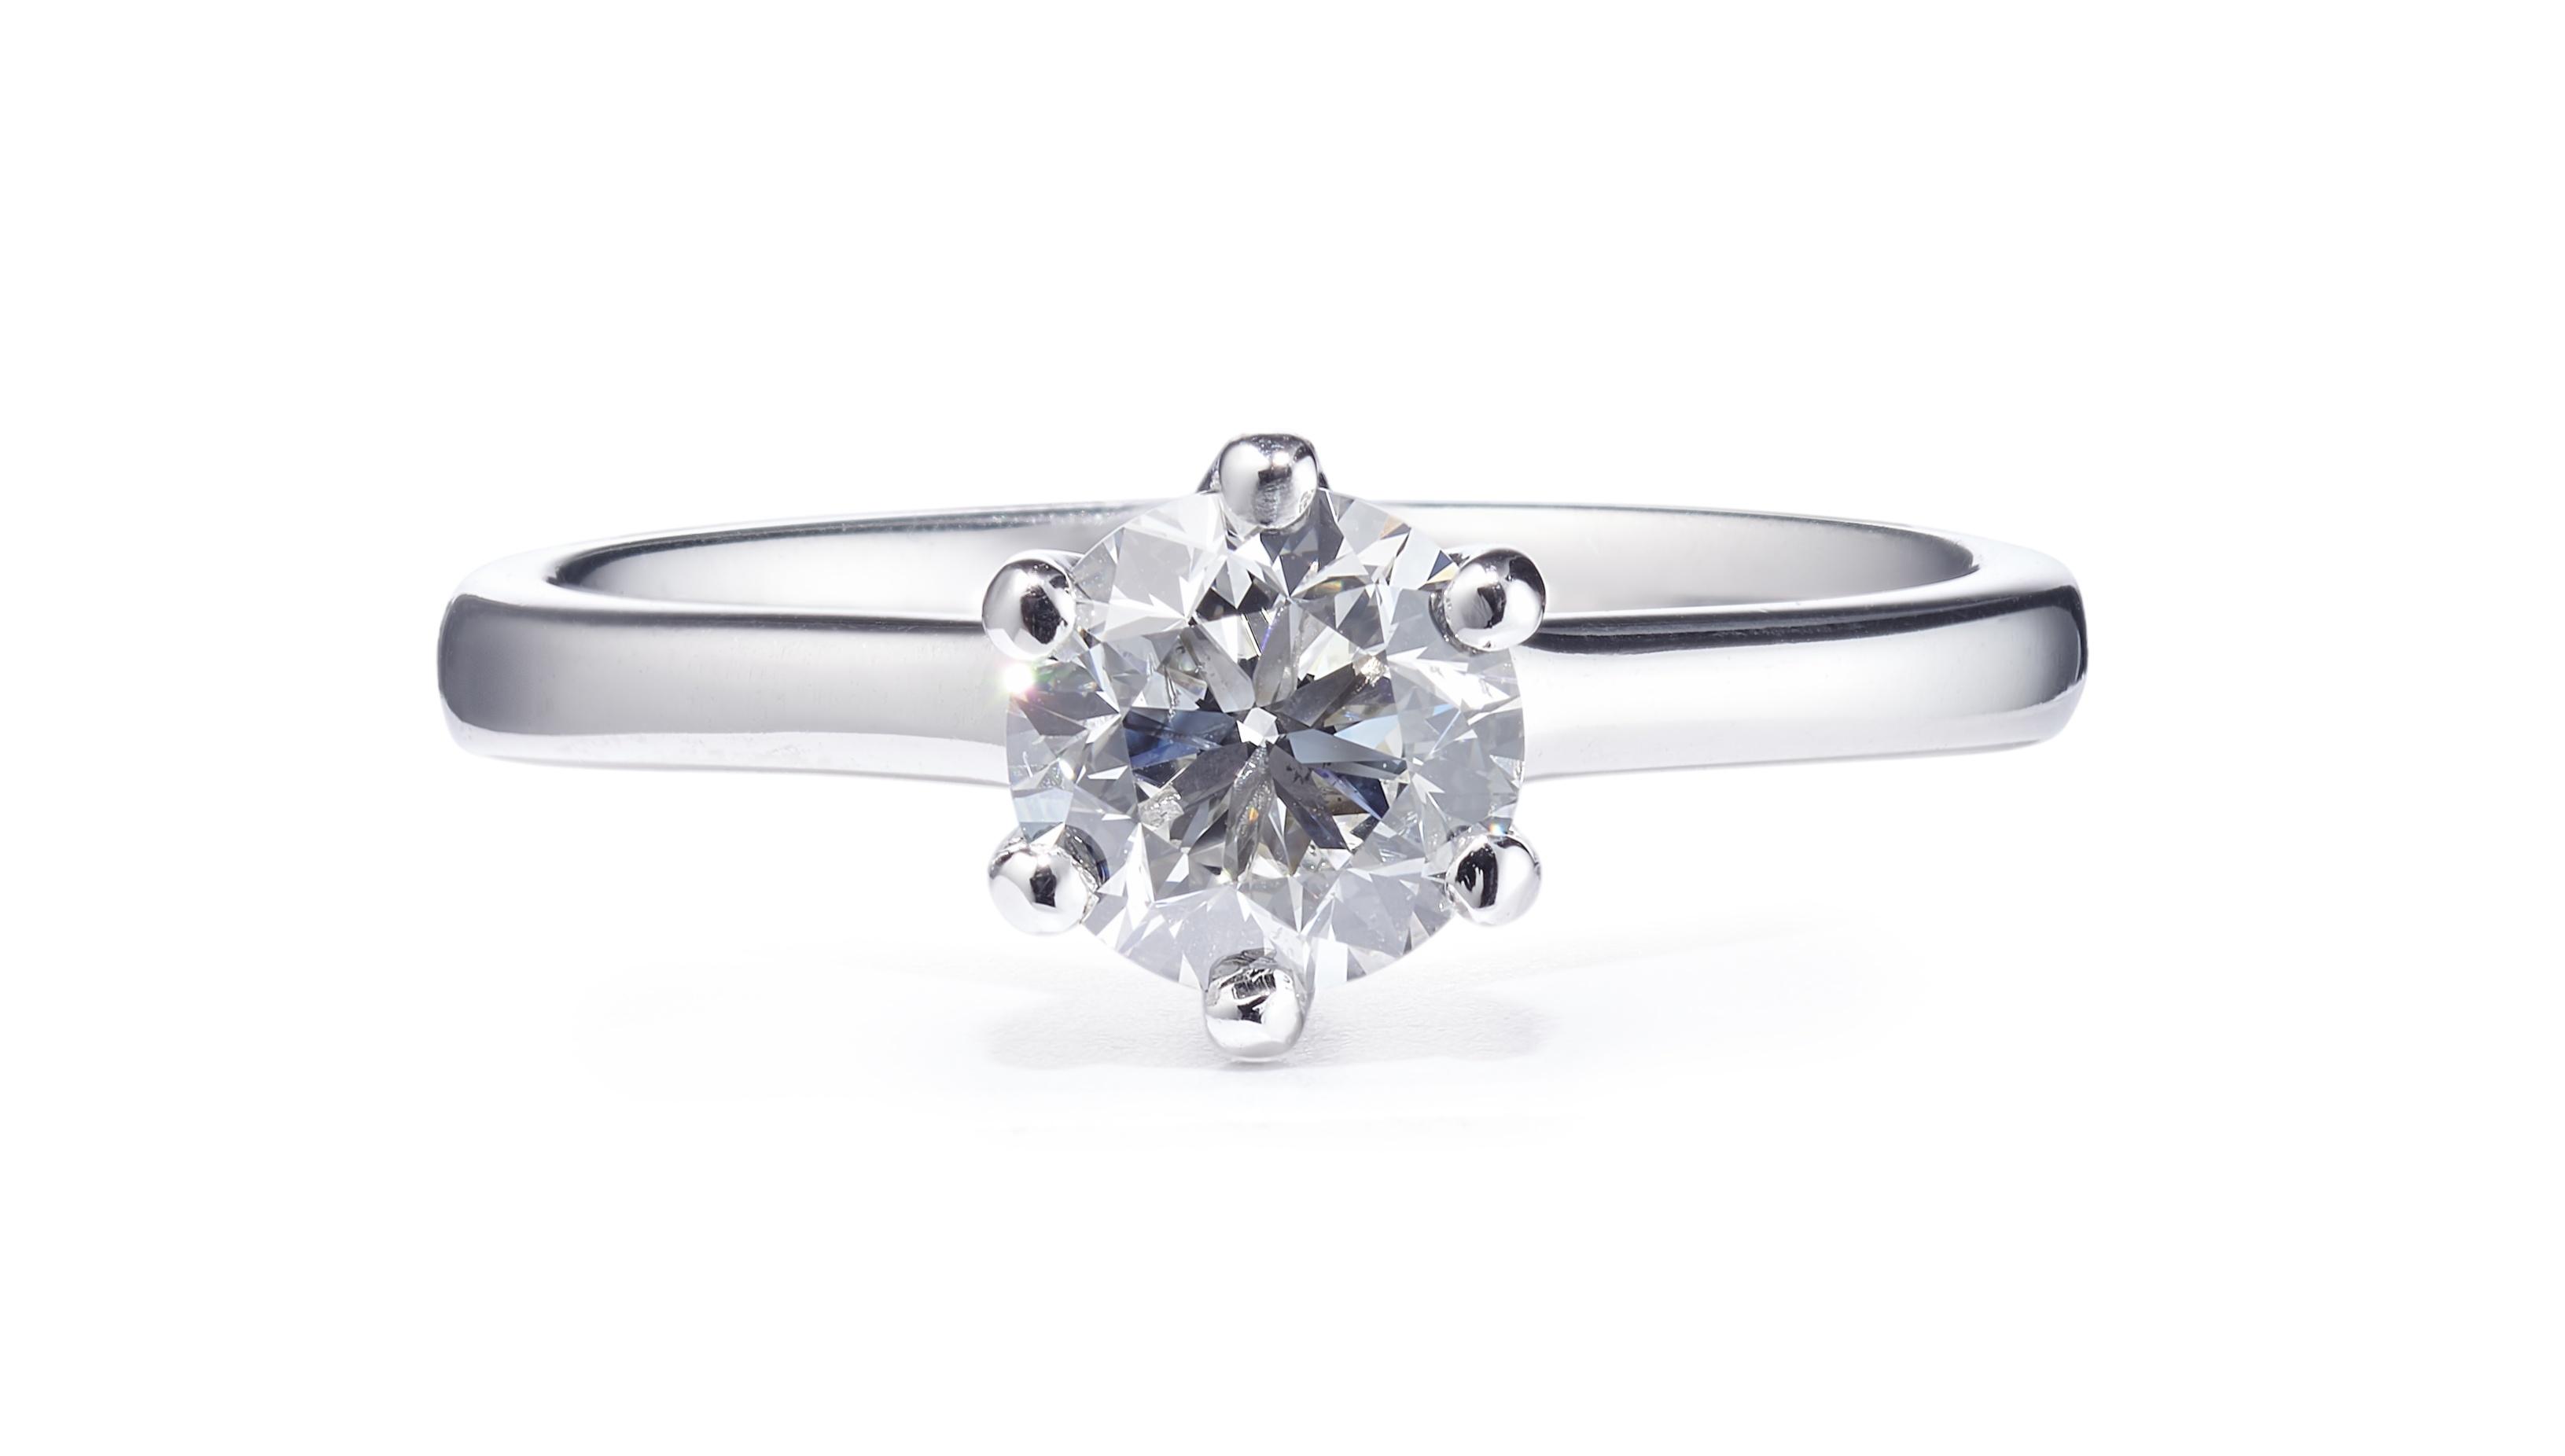 0.90ct Brilliant Cut Diamond Solitaire Ring